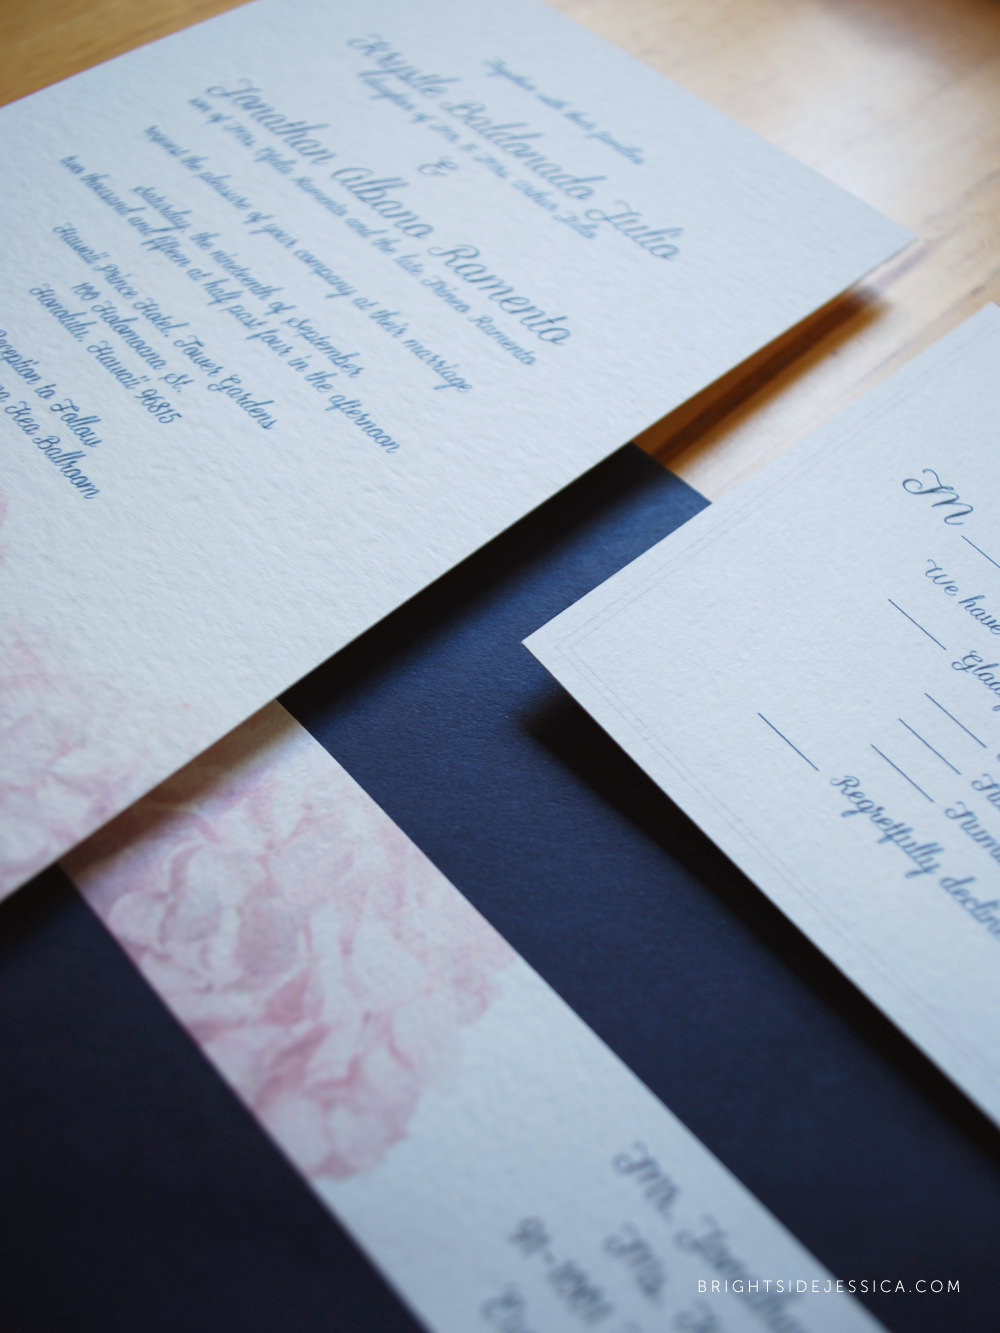 jessicapaloladesign_kj-wedding-stationery_3.jpg